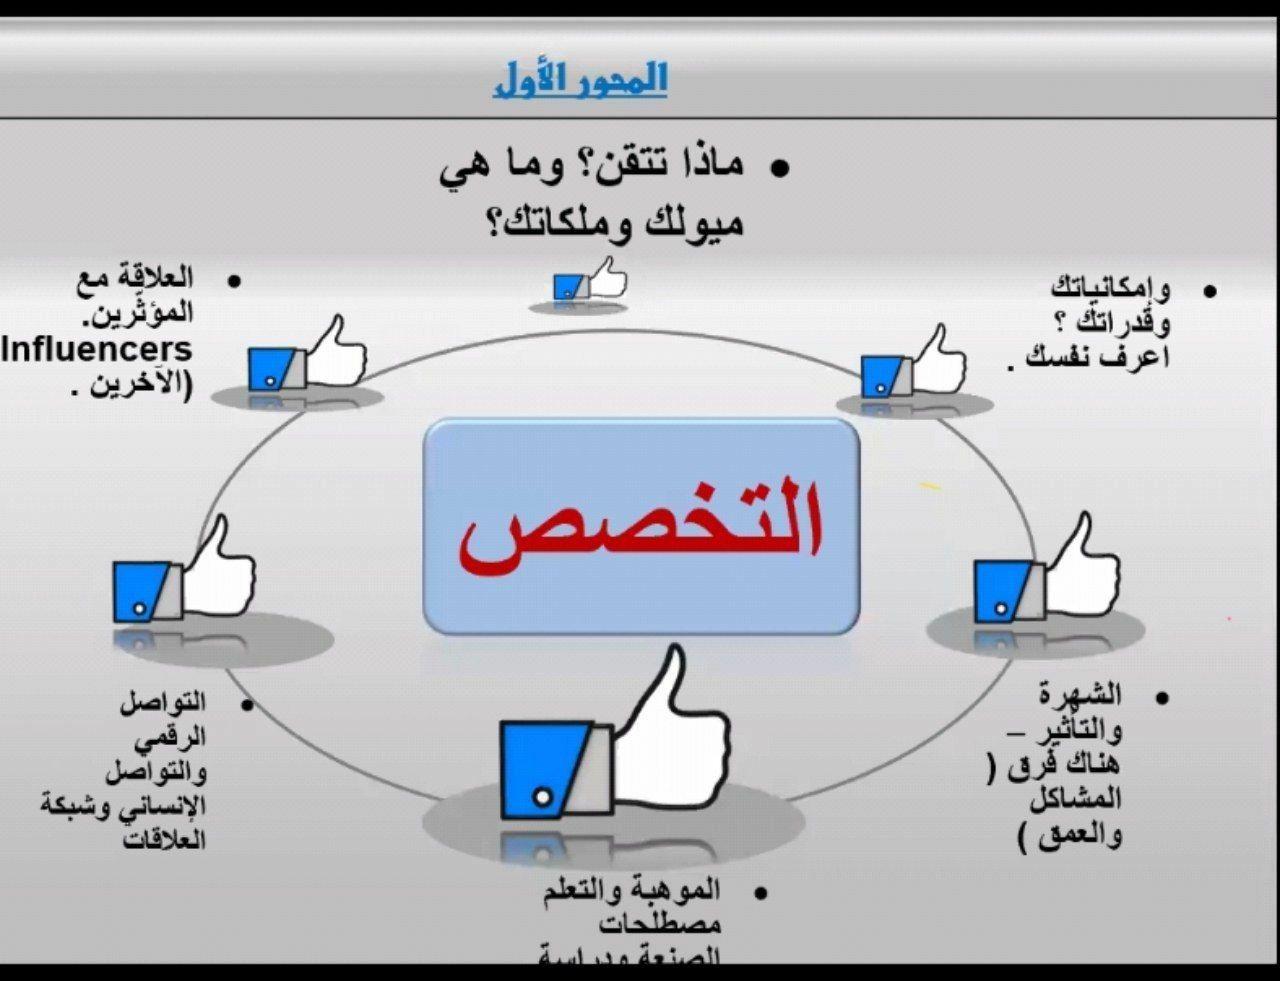 Pin By أسعد فرحان الفيفي On مختارات تطوير ذاتي وصحي وإداري In 2020 Map Map Screenshot Influence